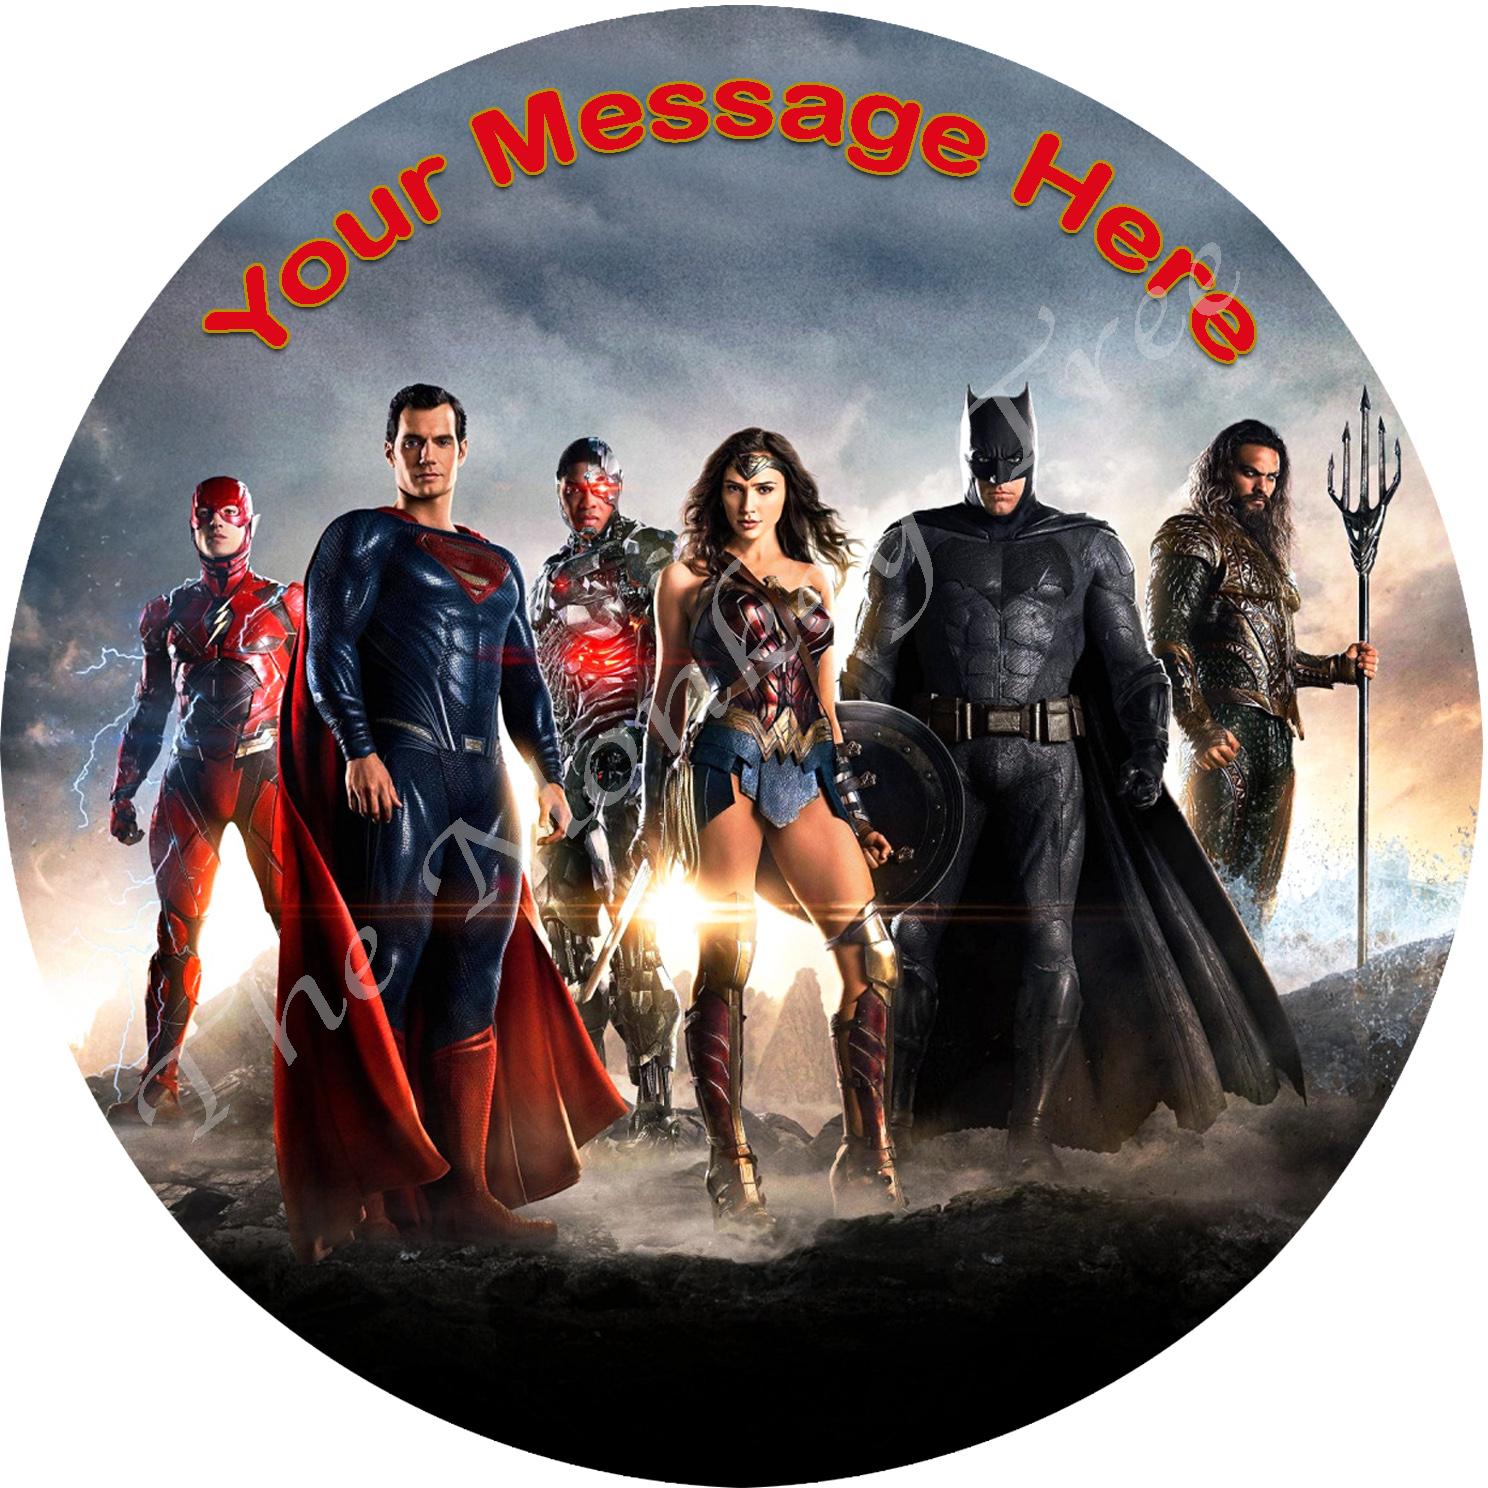 Wonder Woman justice league edible cake image topper birthday party cake fondant superhero superman batman flash